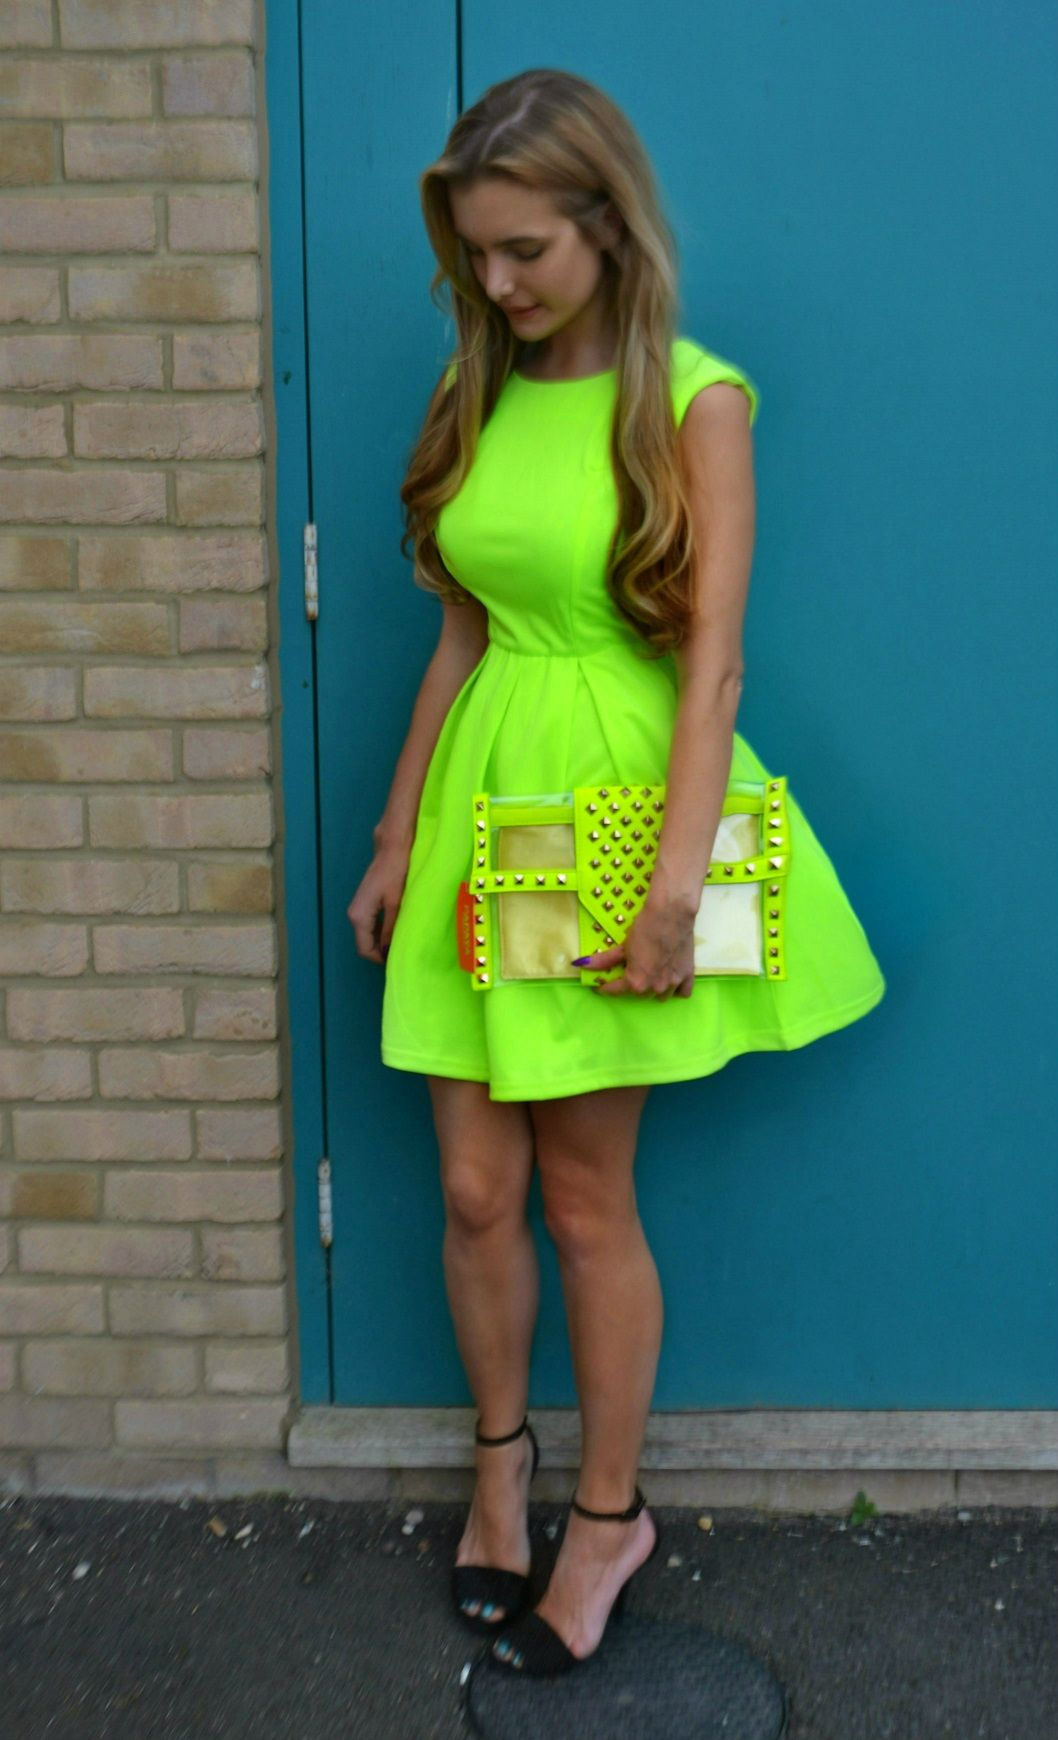 Neon yellow dress | Tumblr | possibly prom. | Pinterest | Vestido elegante Elegante y Femenino